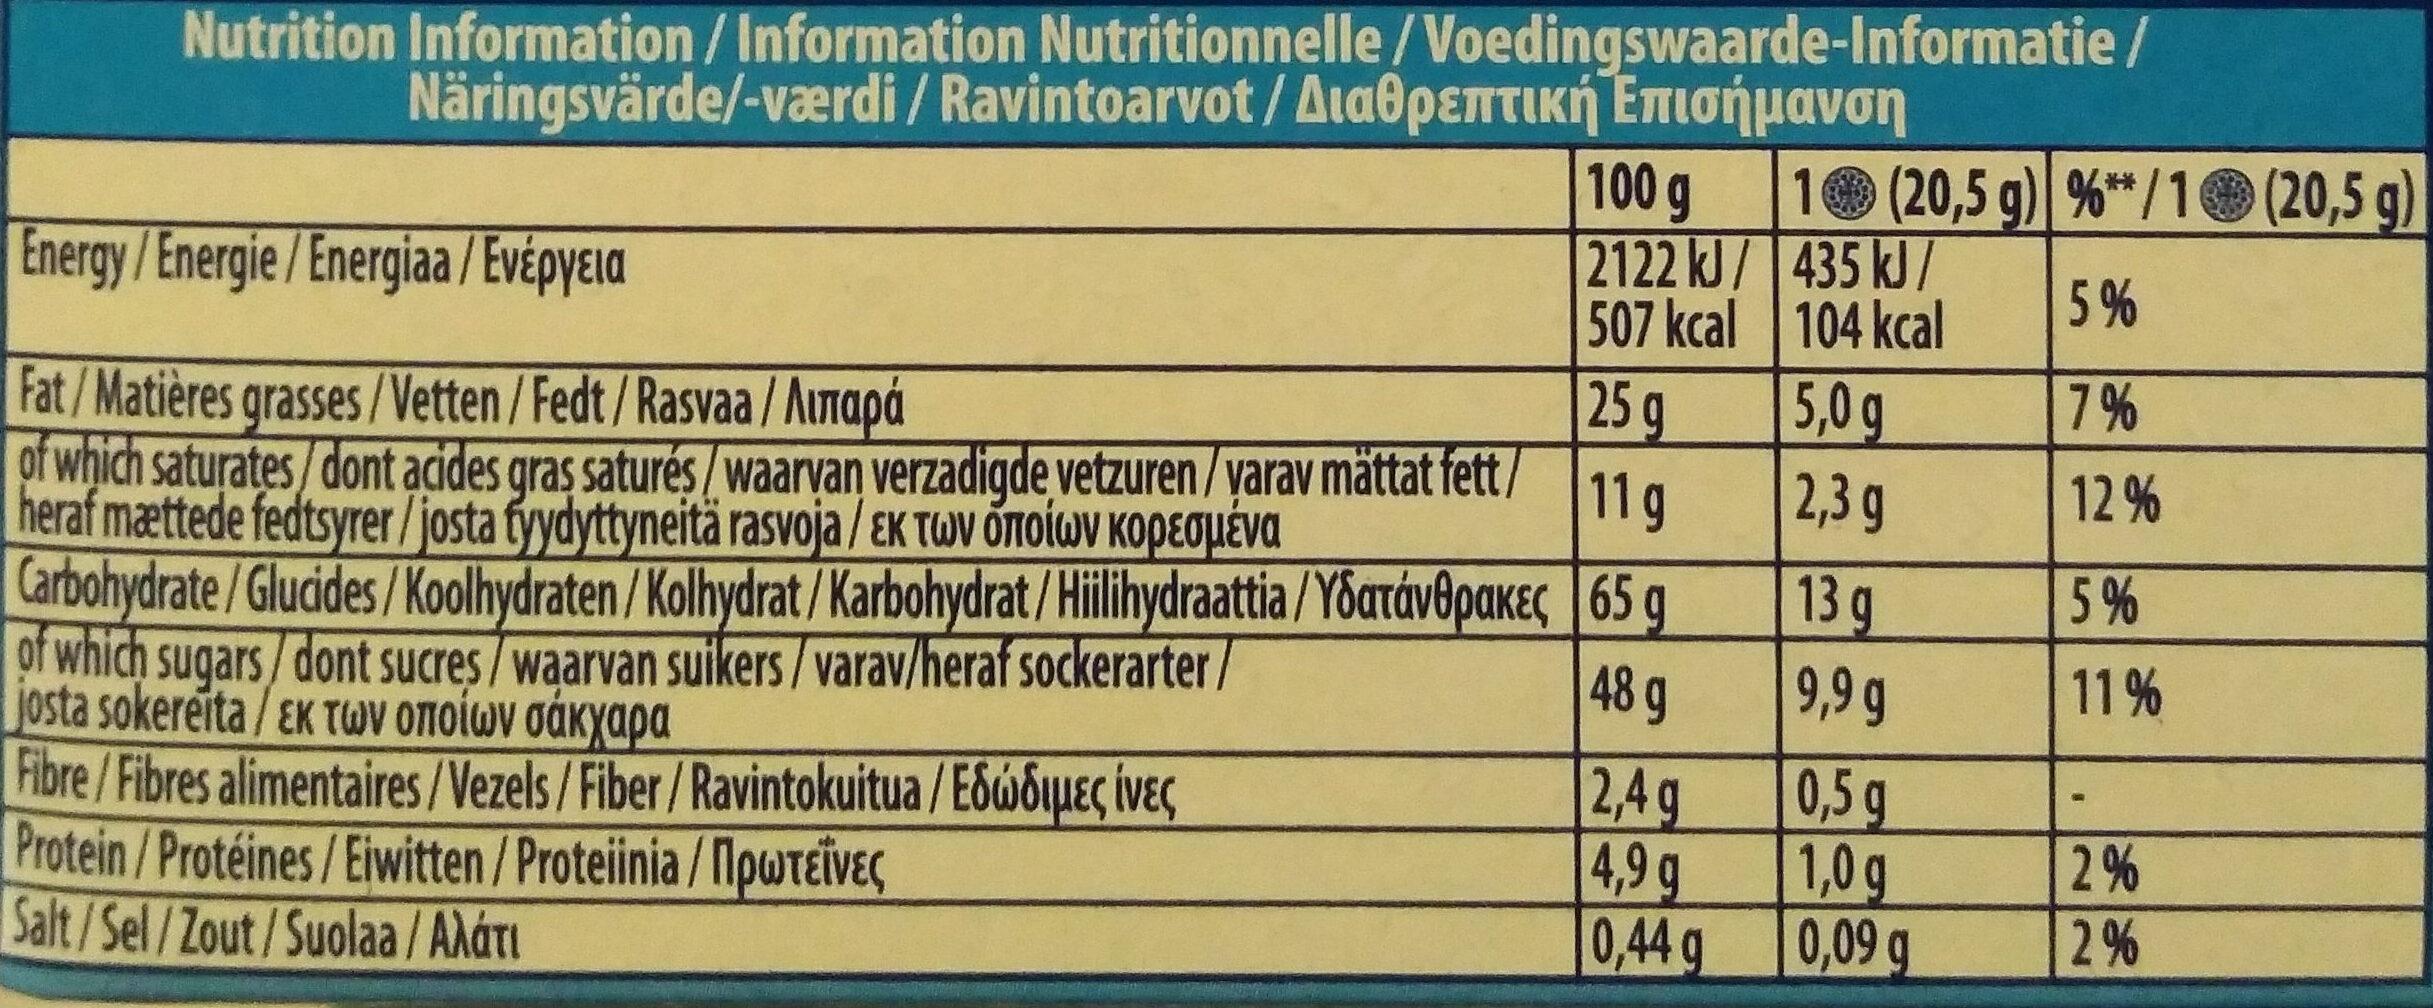 Milk Chocolate Covered Biscuits 6 Pack - Voedingswaarden - nl